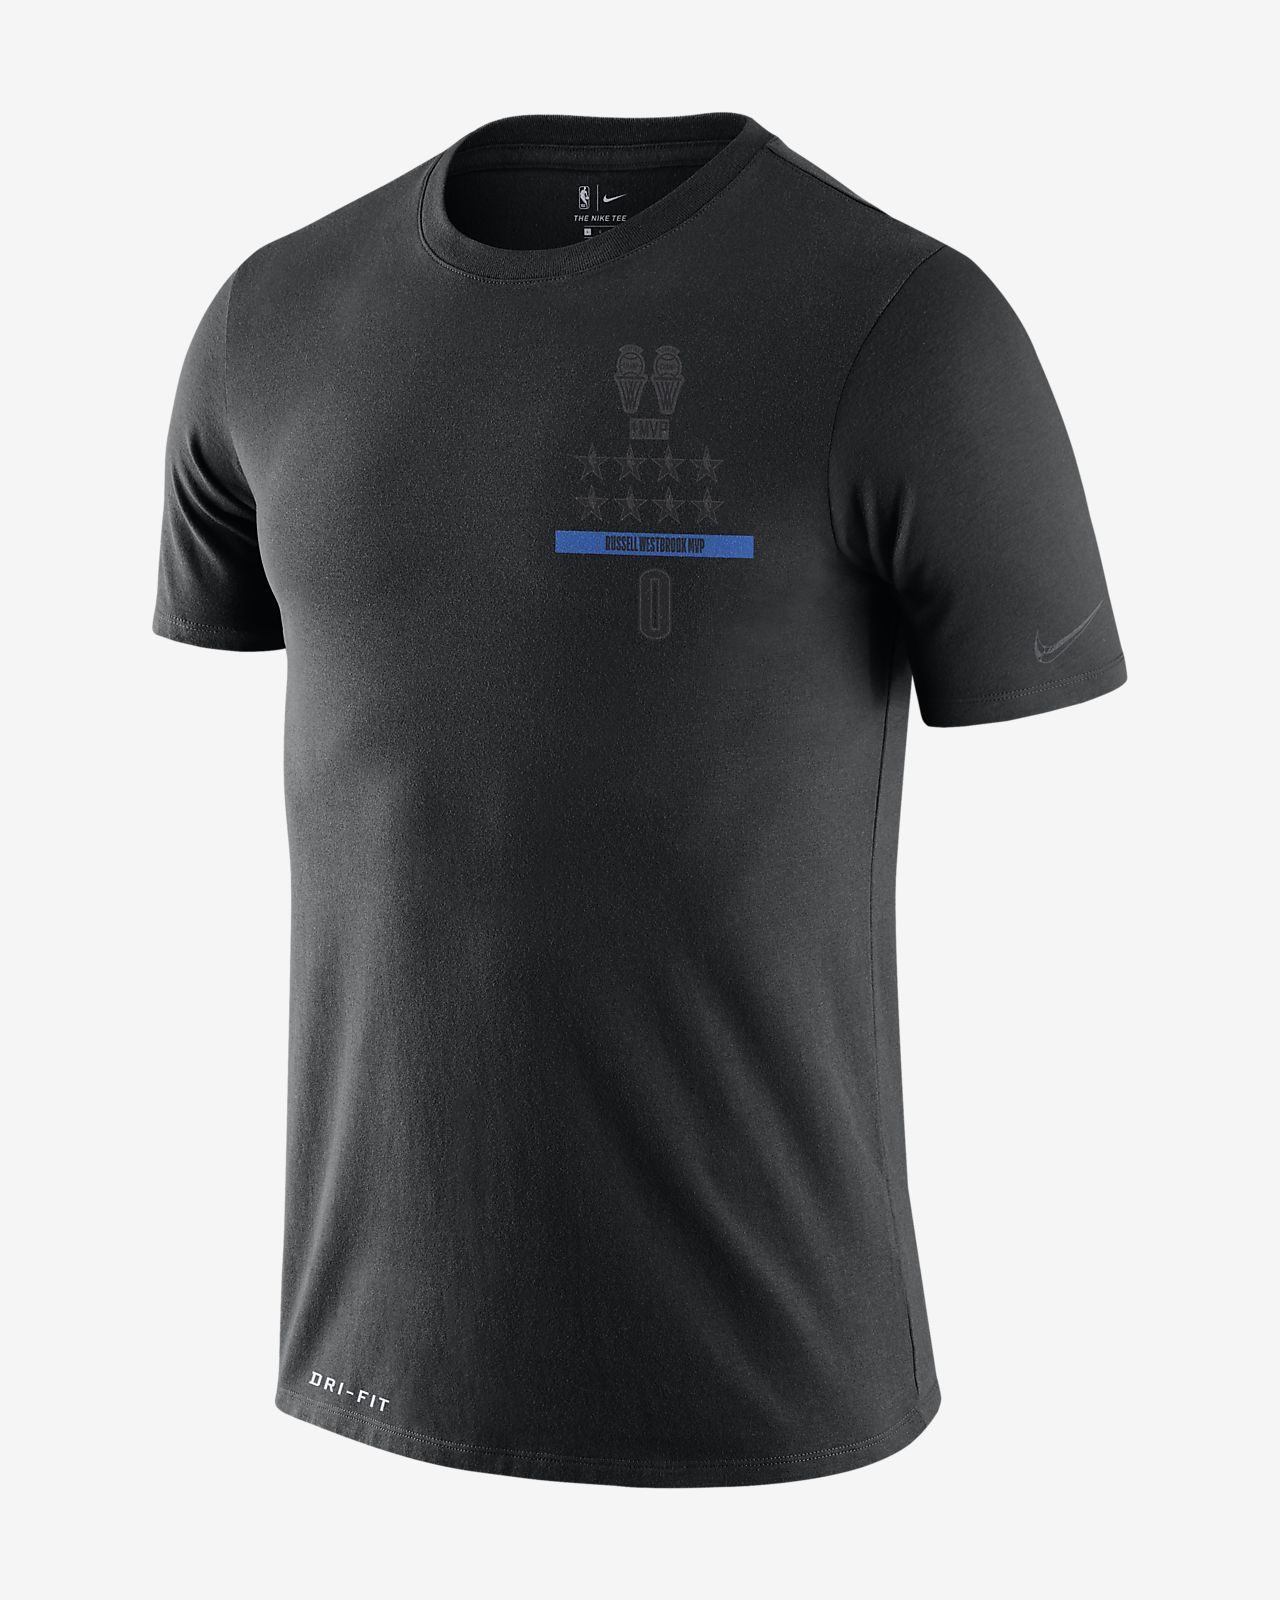 "T-shirt Russell Westbrook Nike Dri-FIT ""MVP"" NBA - Uomo"